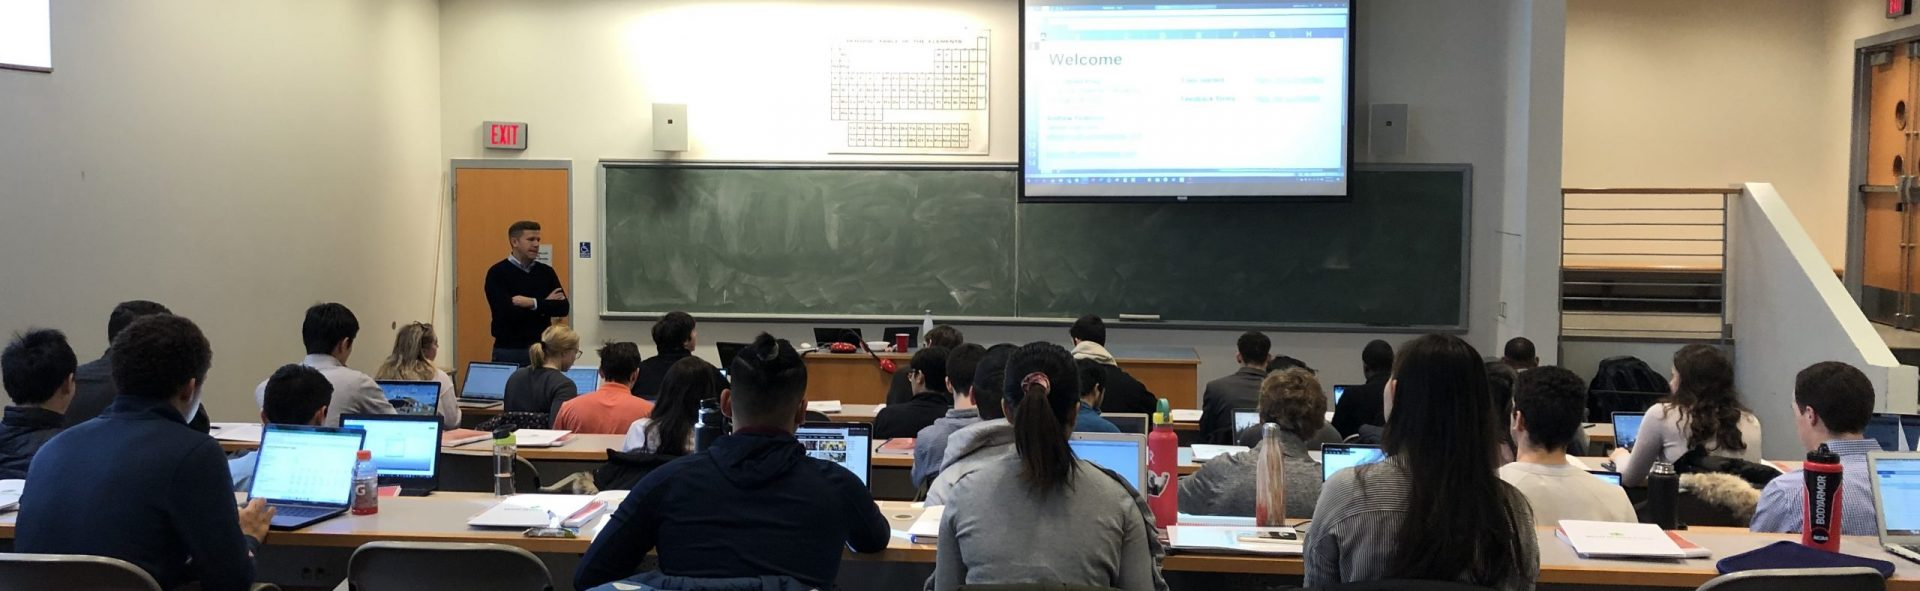 Bowdoin College Finance Society